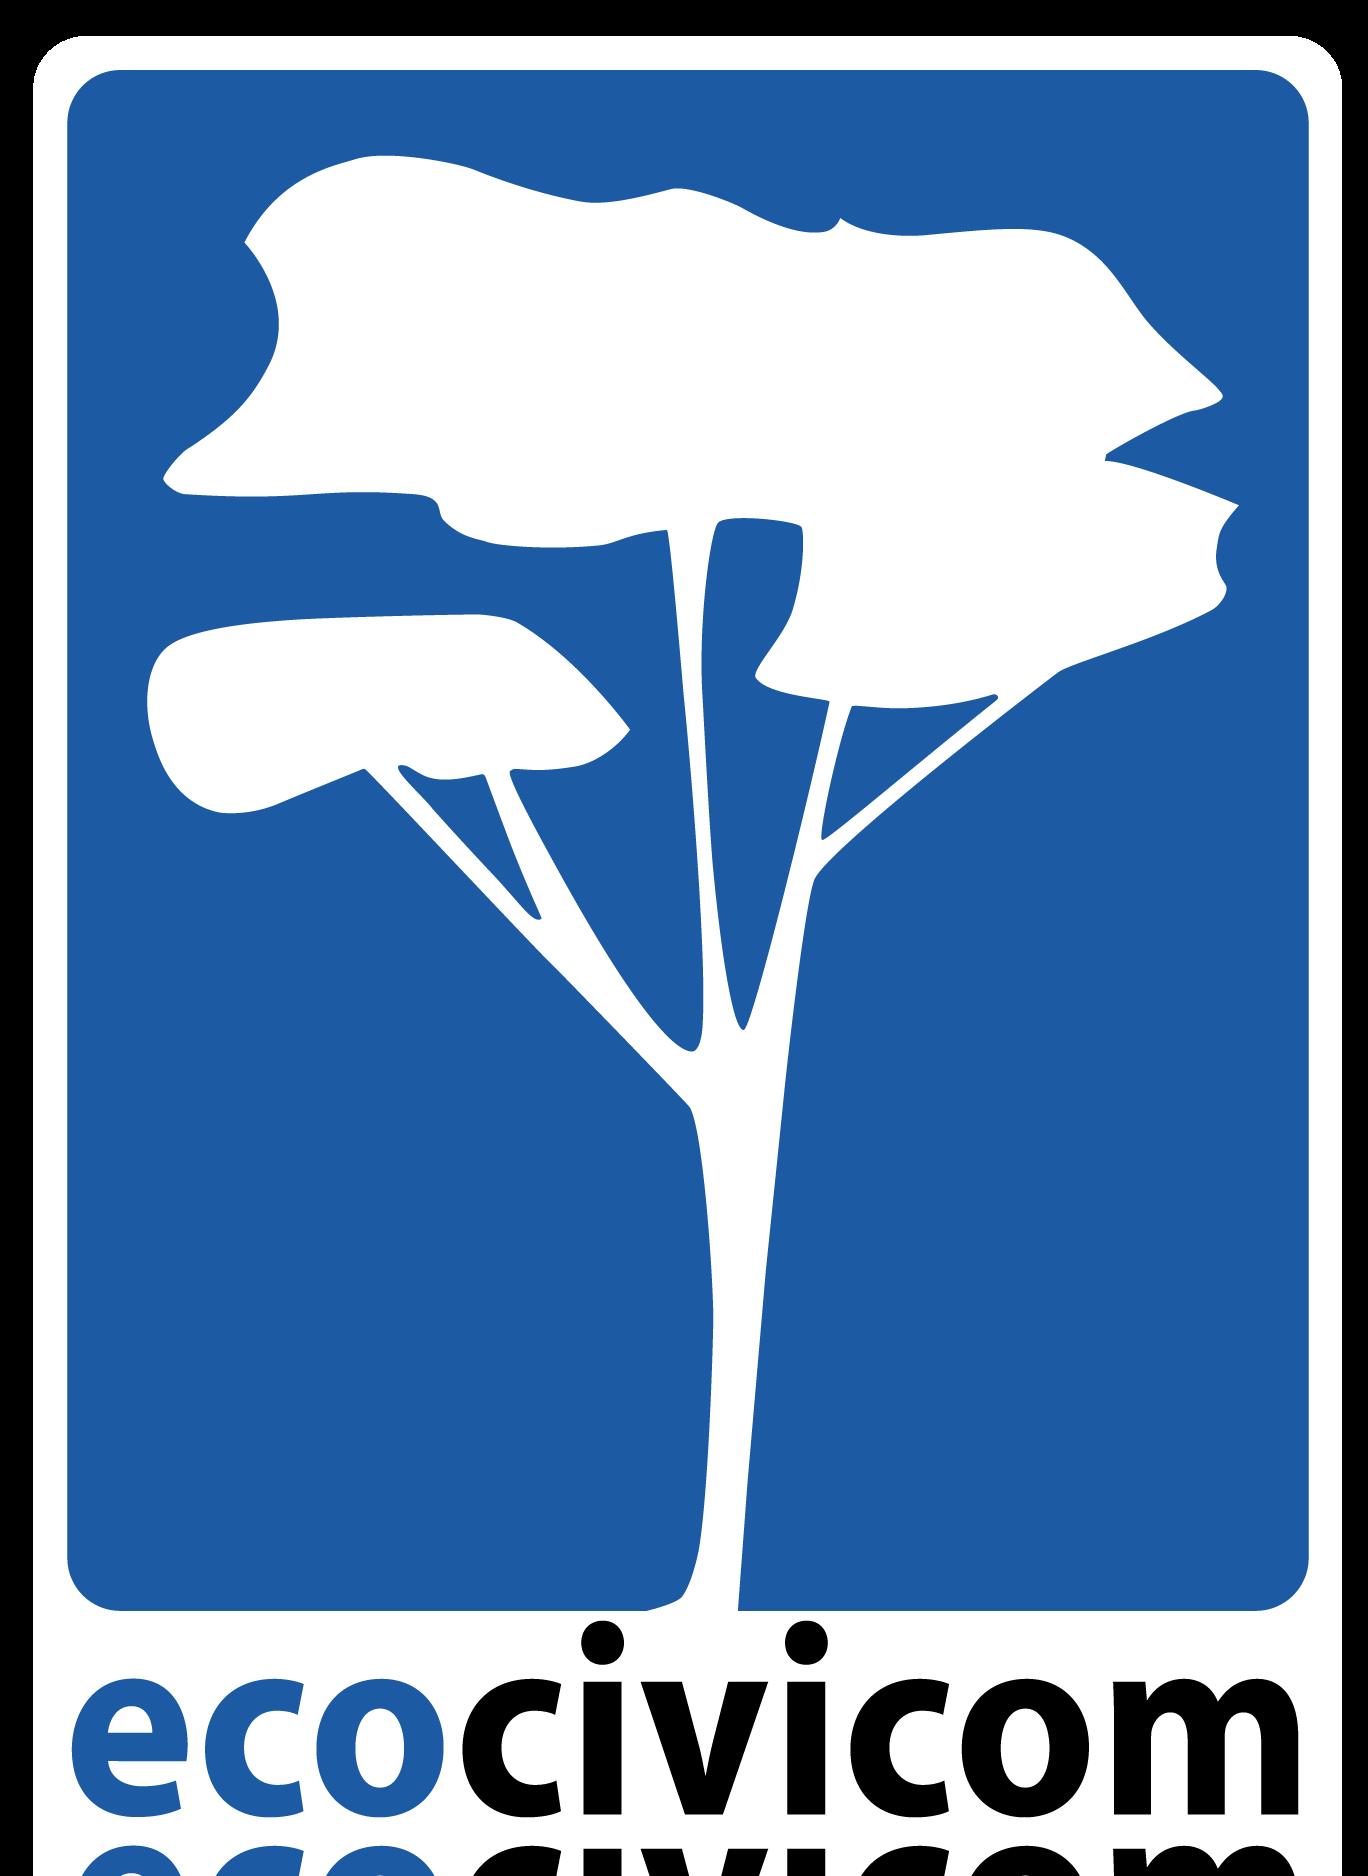 vectorisation de logotype creation